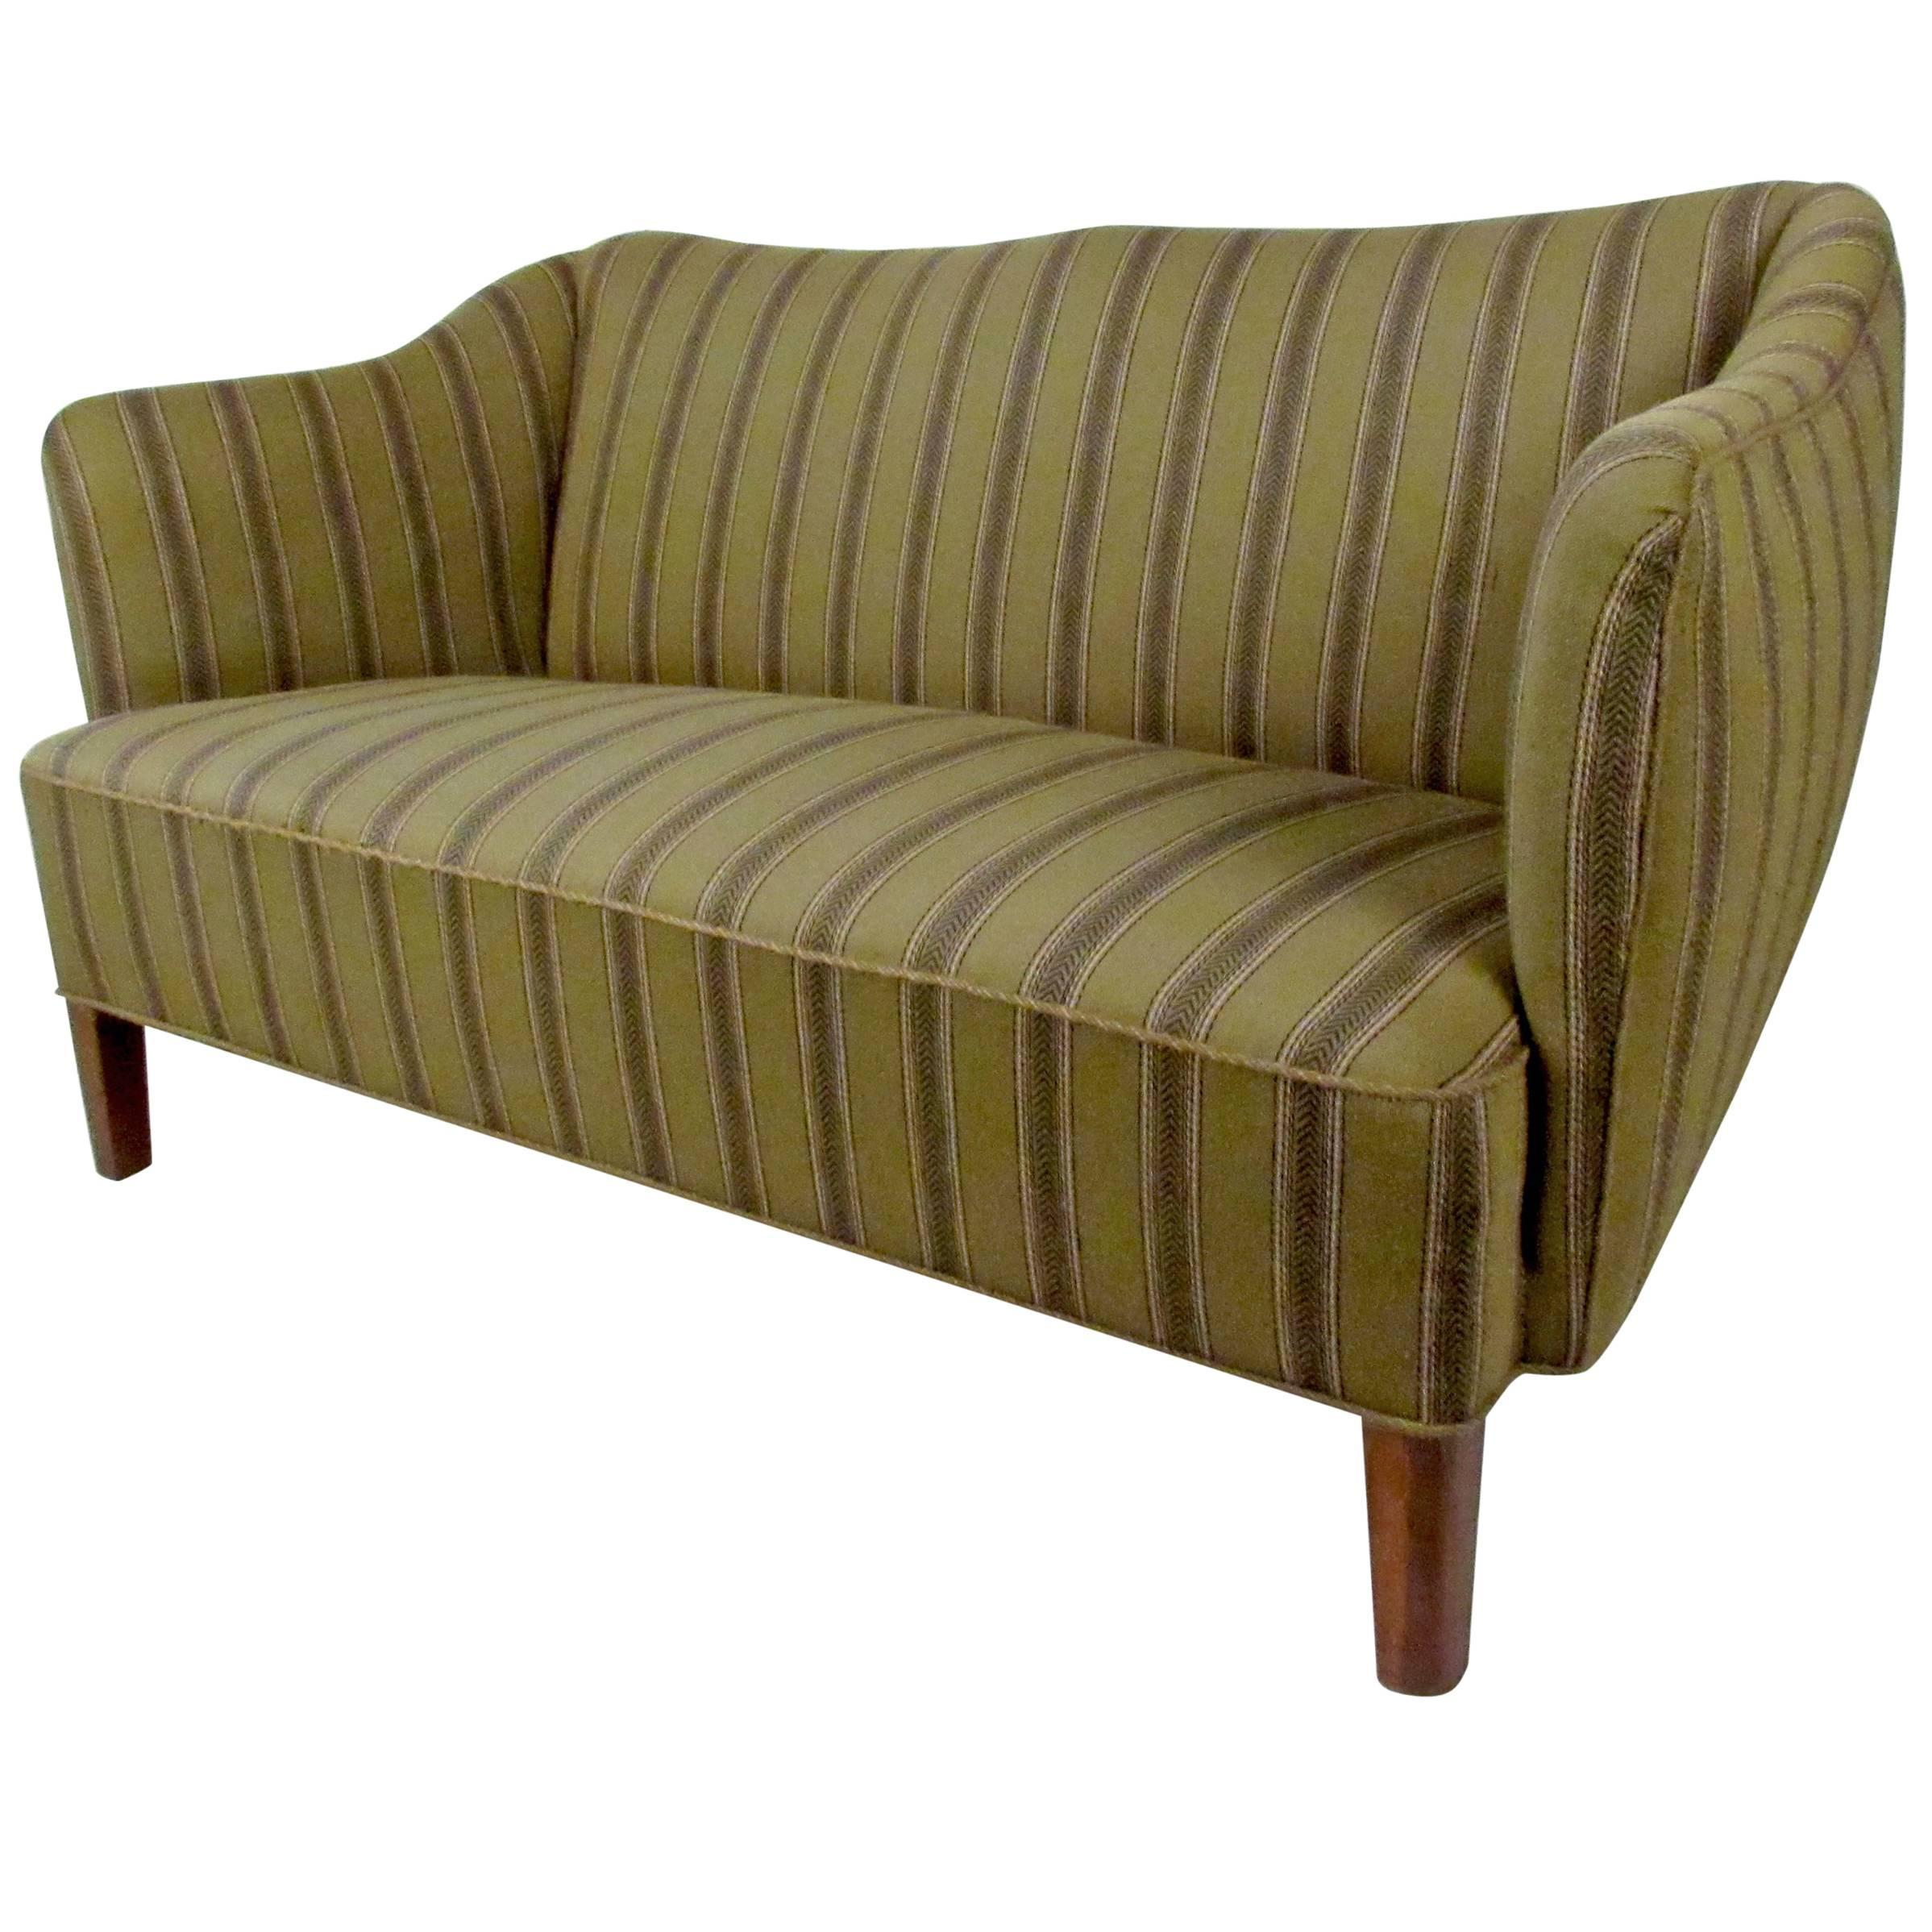 Scandinavian Modern Two Seat Sofa